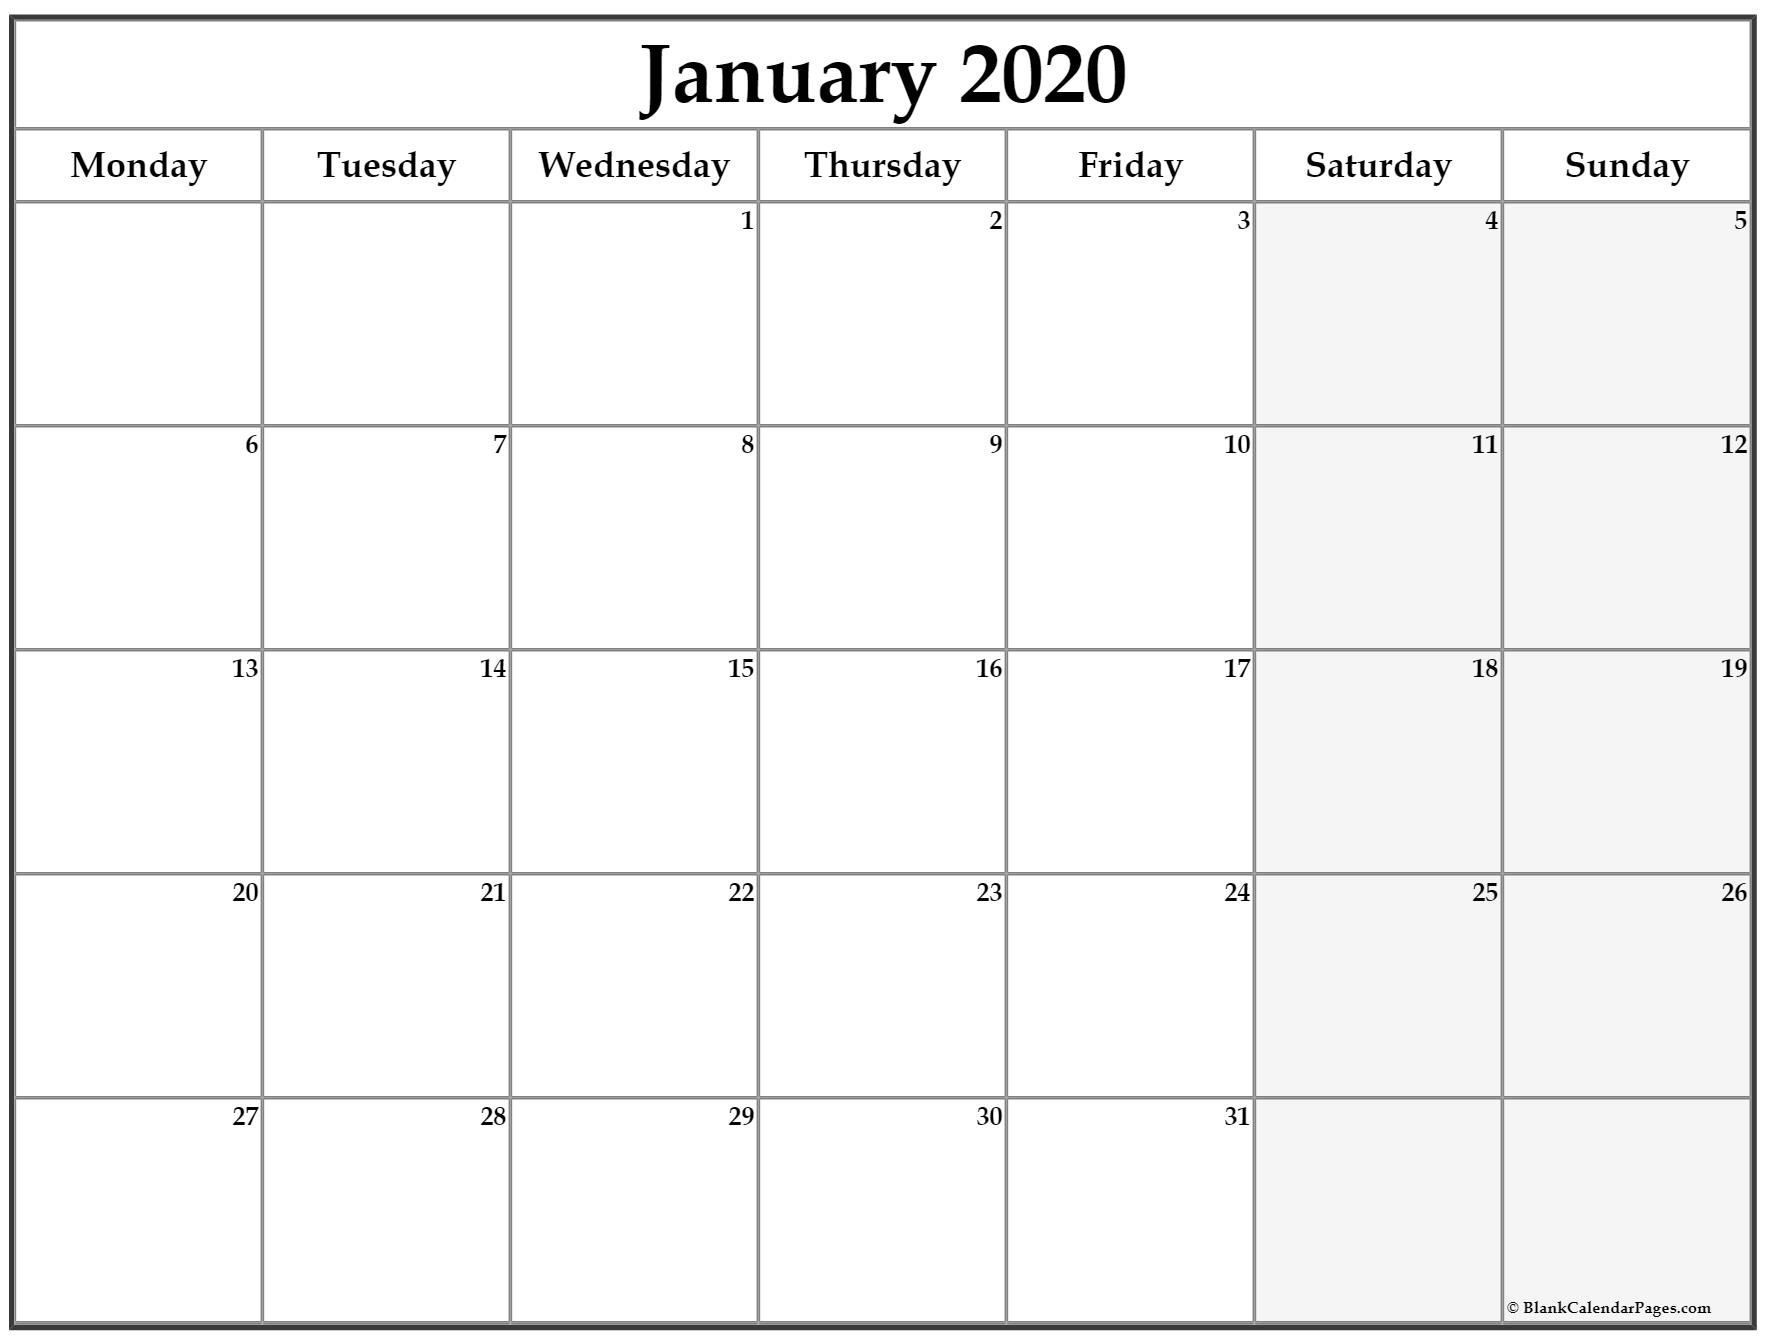 January 2020 Monday Calendar | Monday To Sunday Monday Thru Friday Calendsr